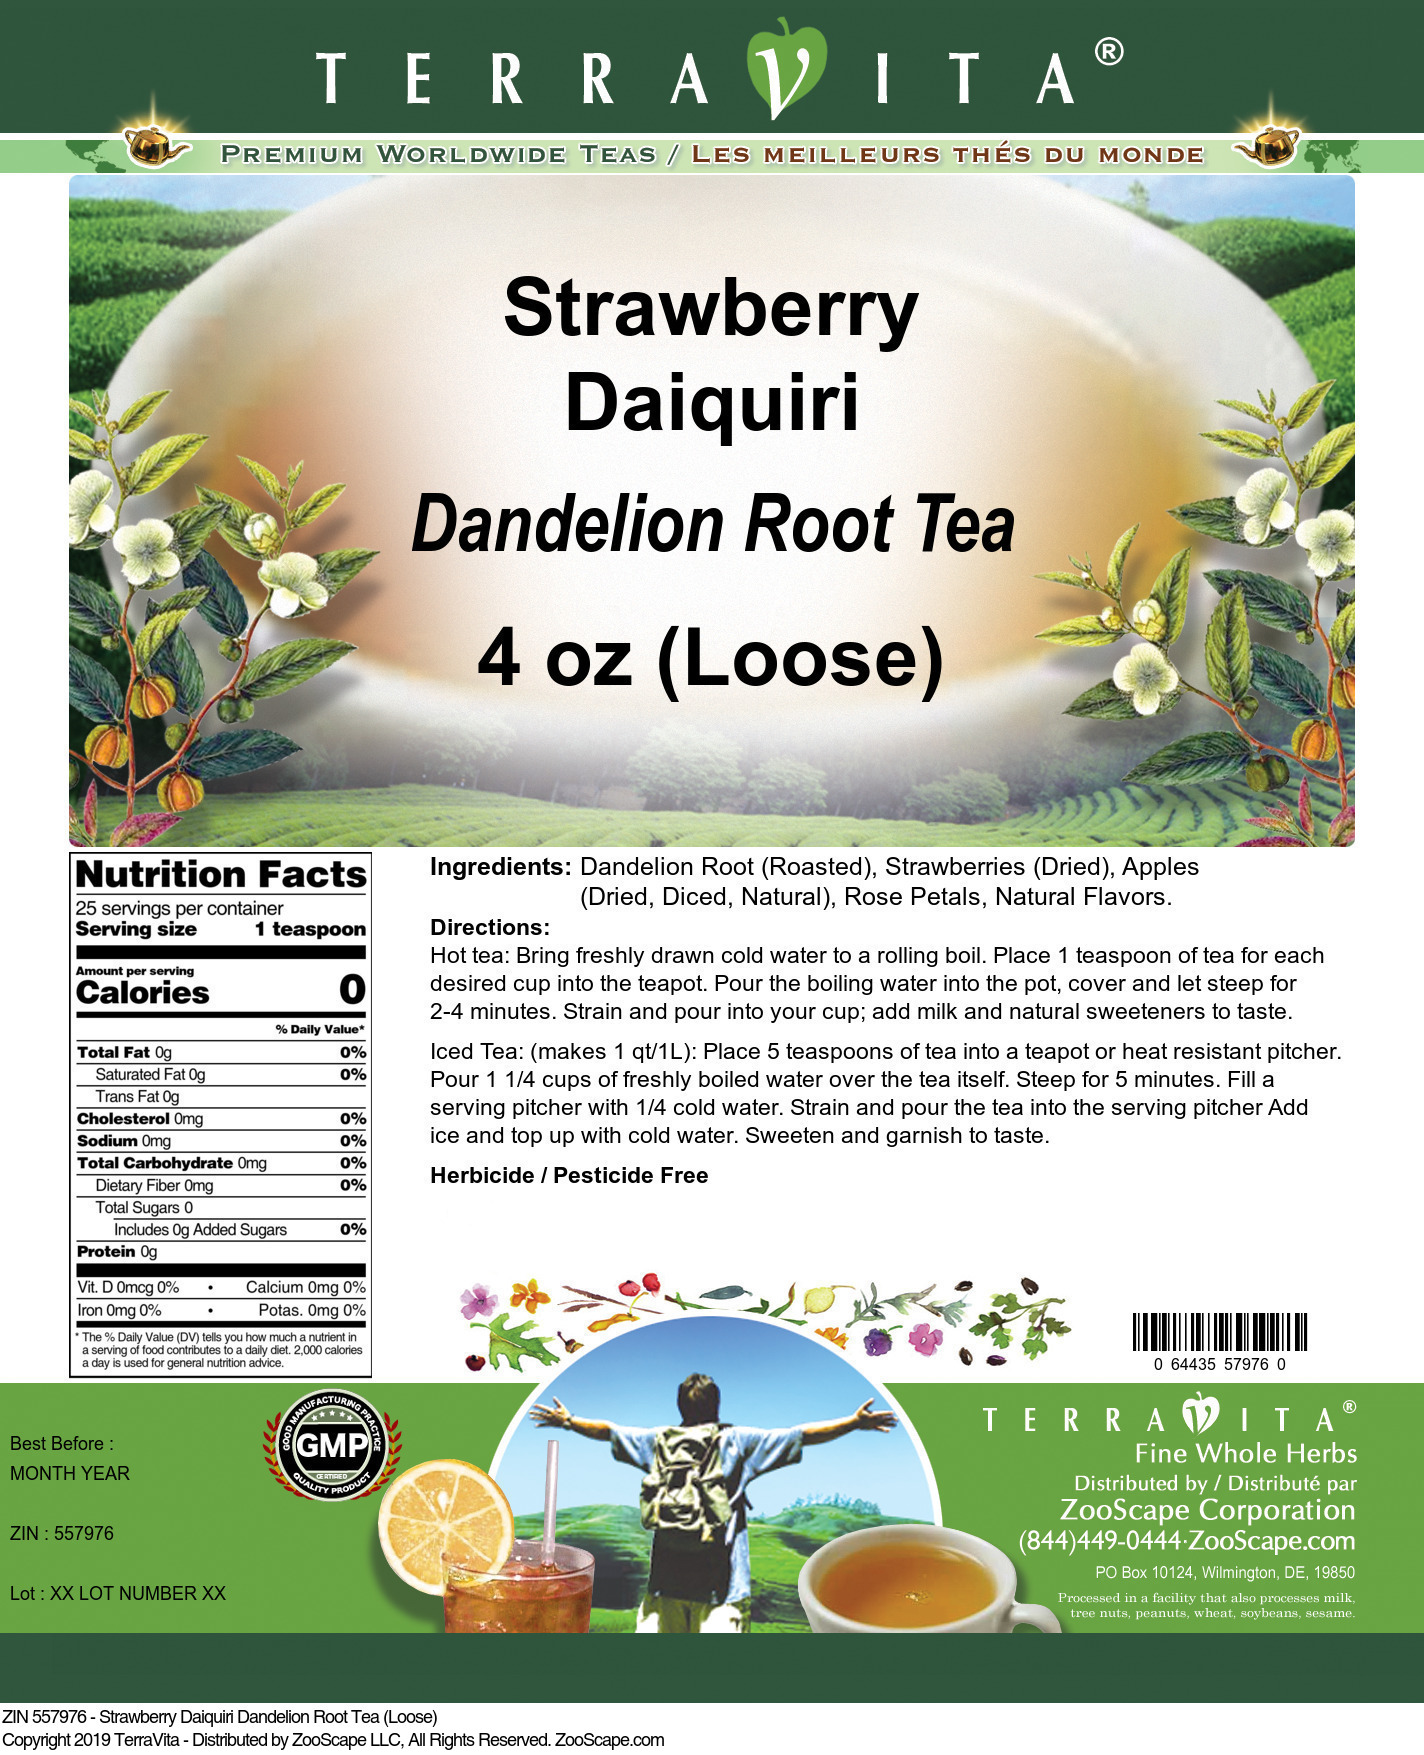 Strawberry Daiquiri Dandelion Root